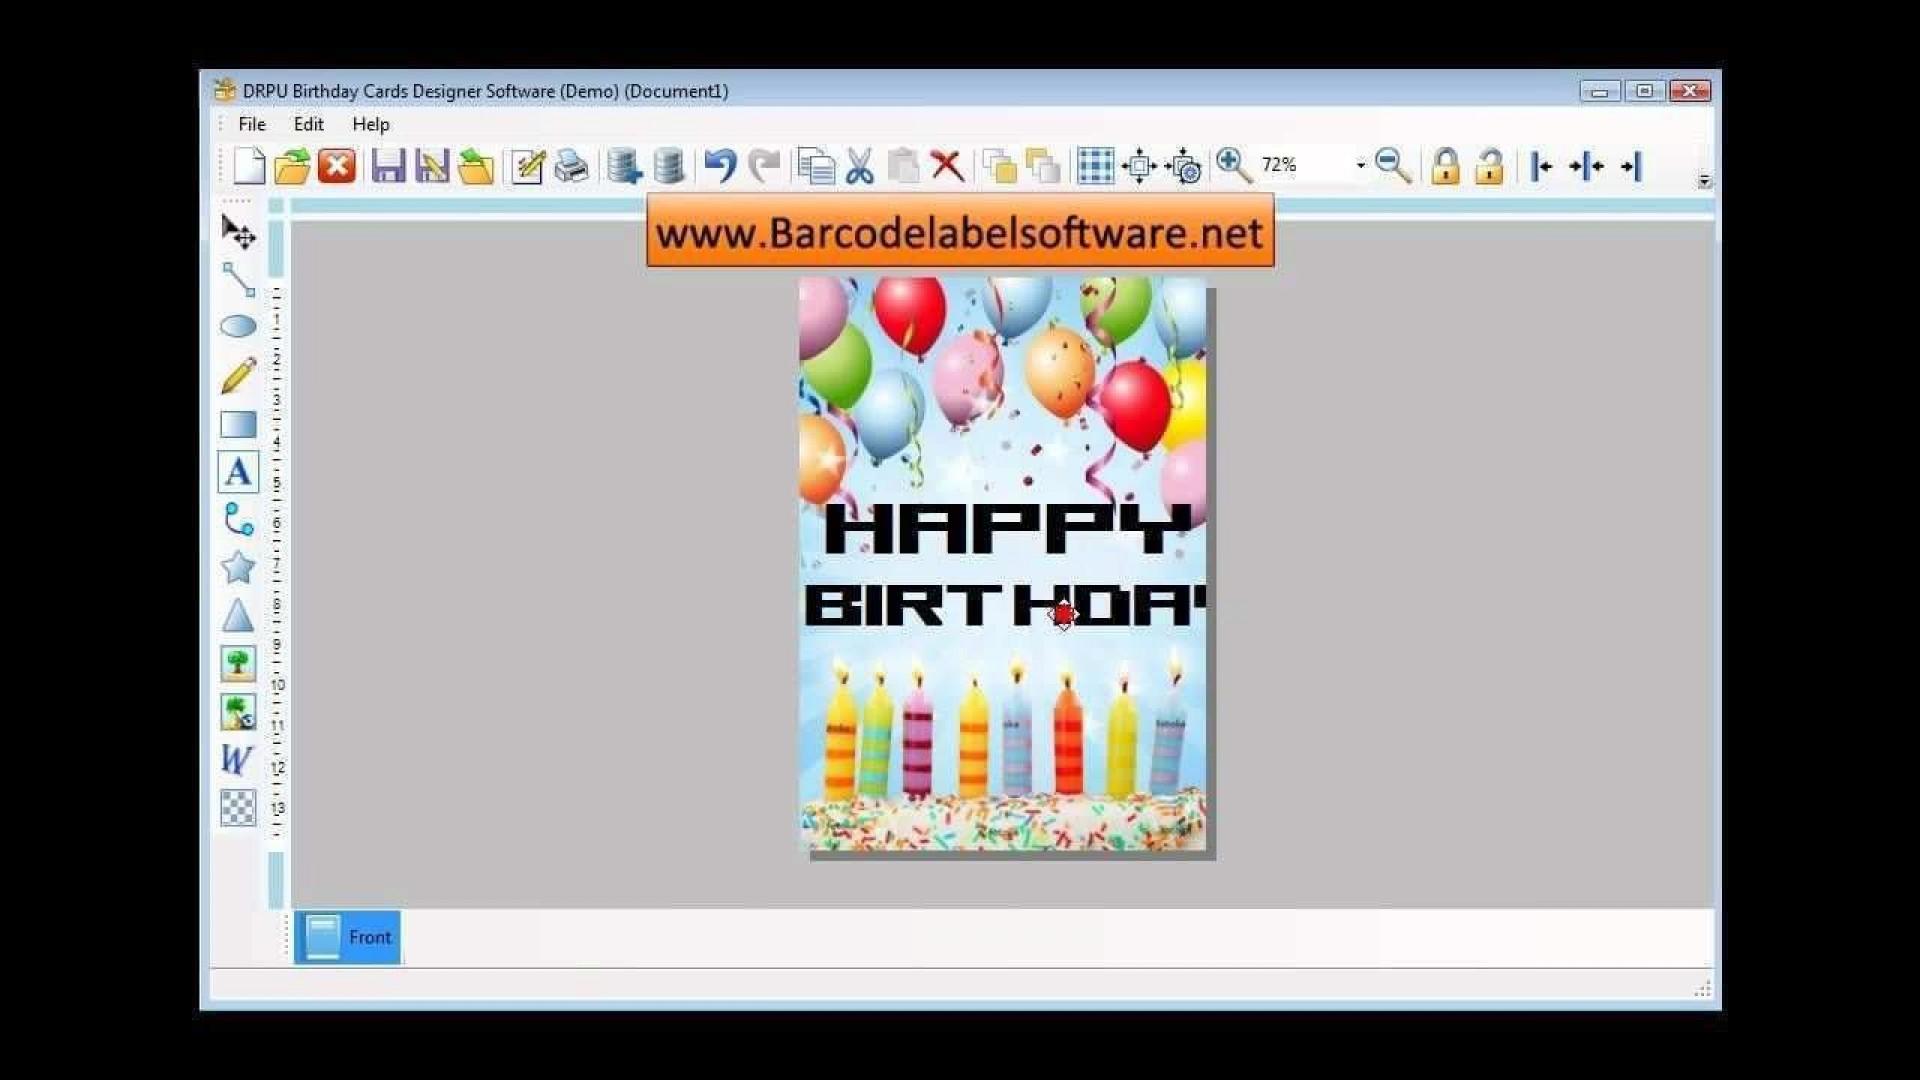 000 Impressive Free Download Invitation Card Design Software Sample  Wedding For Pc Indian1920